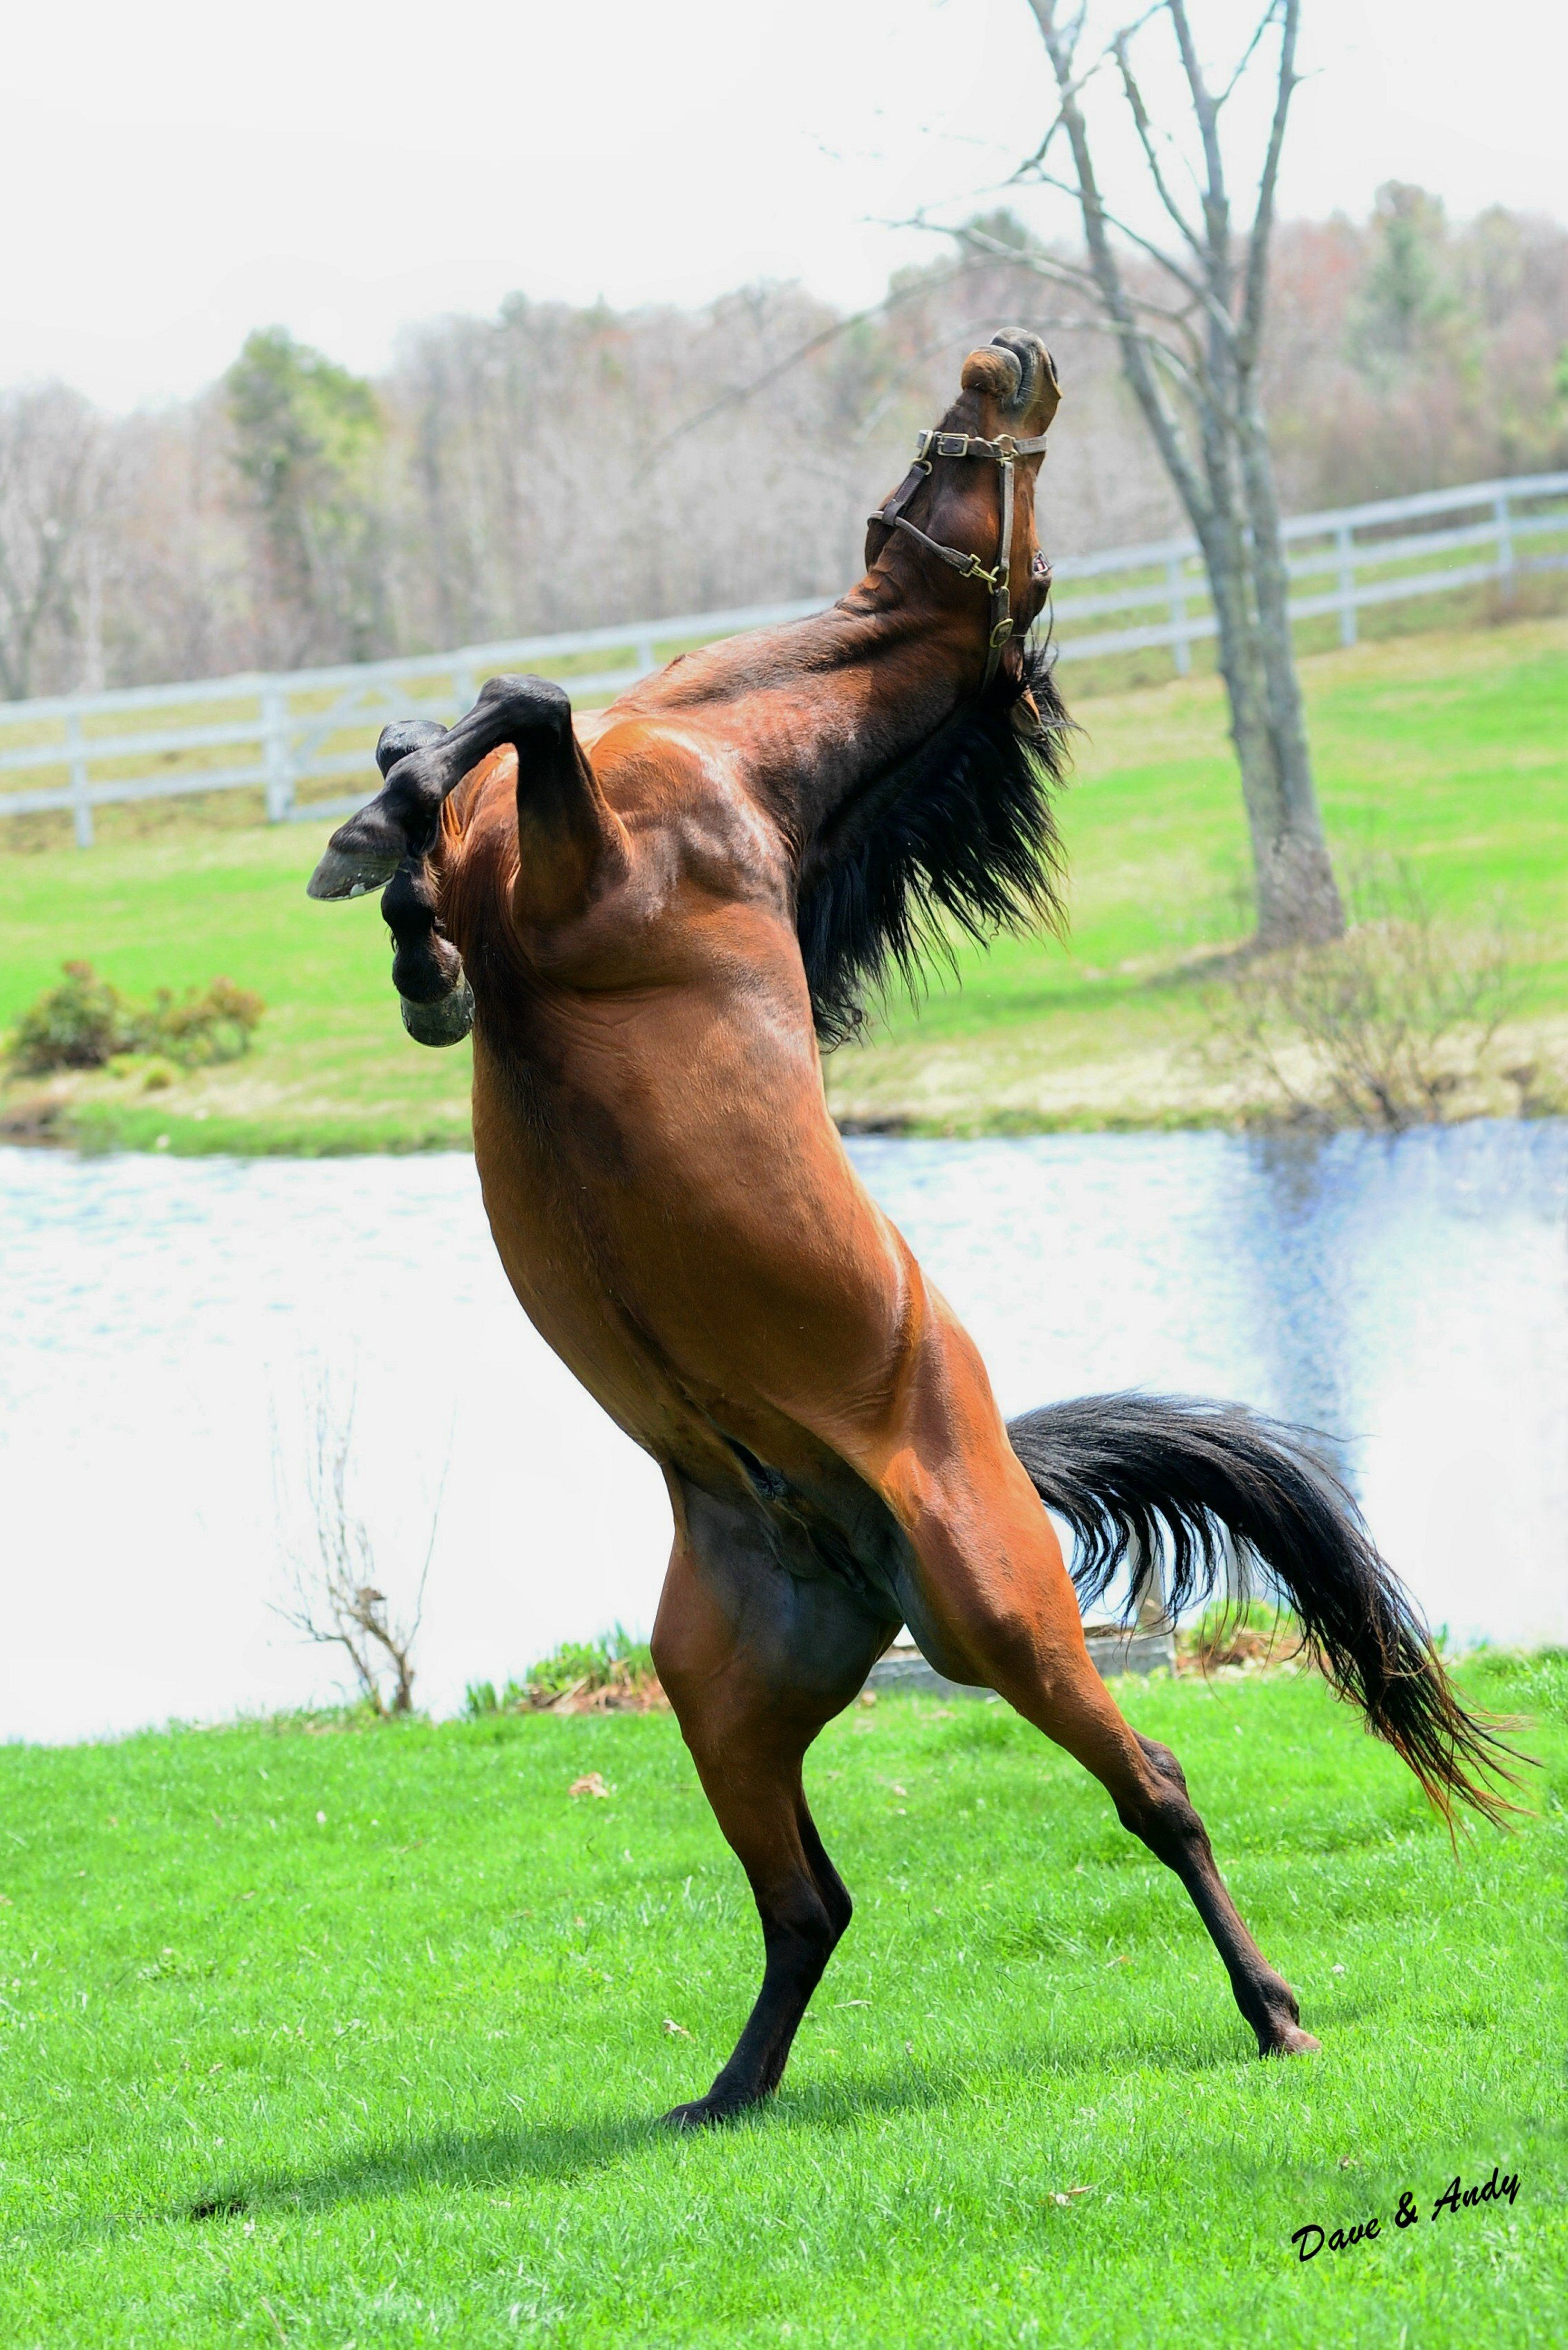 magnificent horse | horses | pinterest | 馬、動物、かっこいい馬の画像集